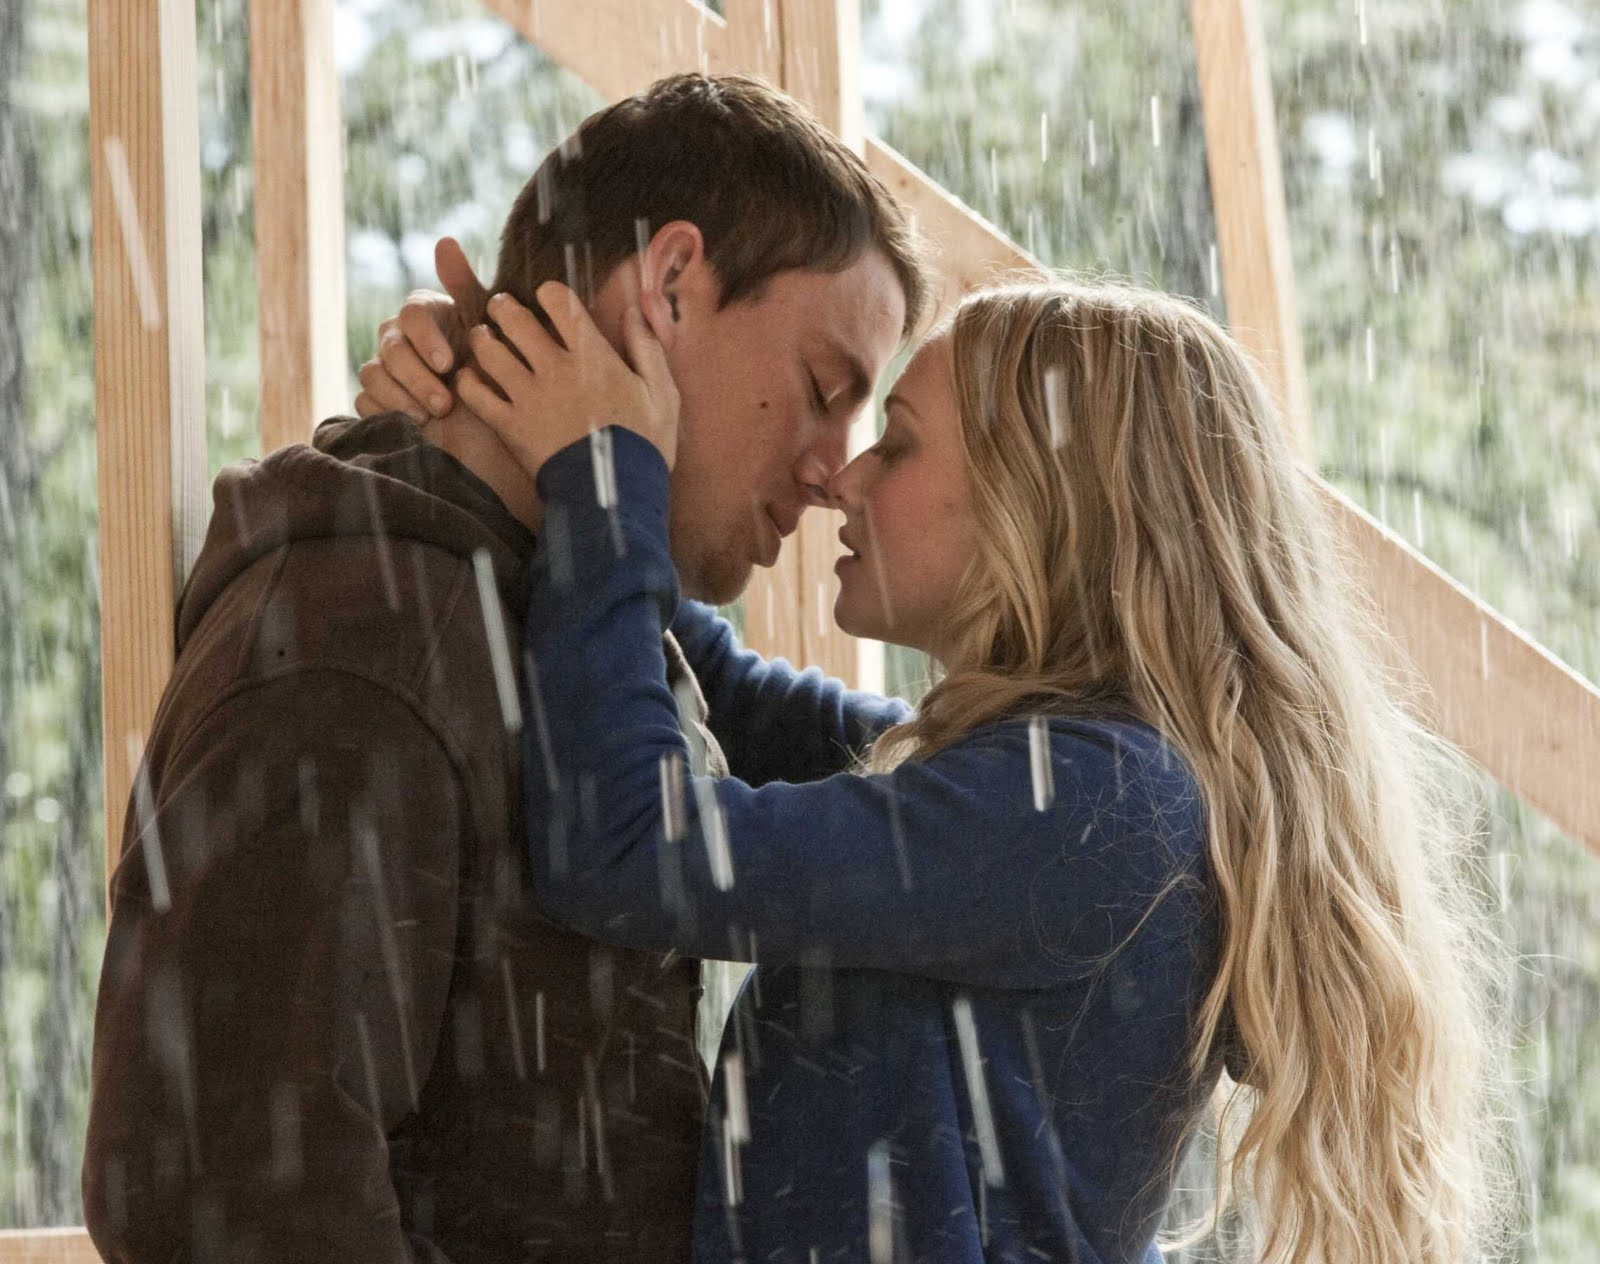 http://2.bp.blogspot.com/-xj1X52IZPk4/TlTSLzc0ltI/AAAAAAAAFCk/vv517r2qh28/s1600/Kissing+Couple+in+Rain.jpg